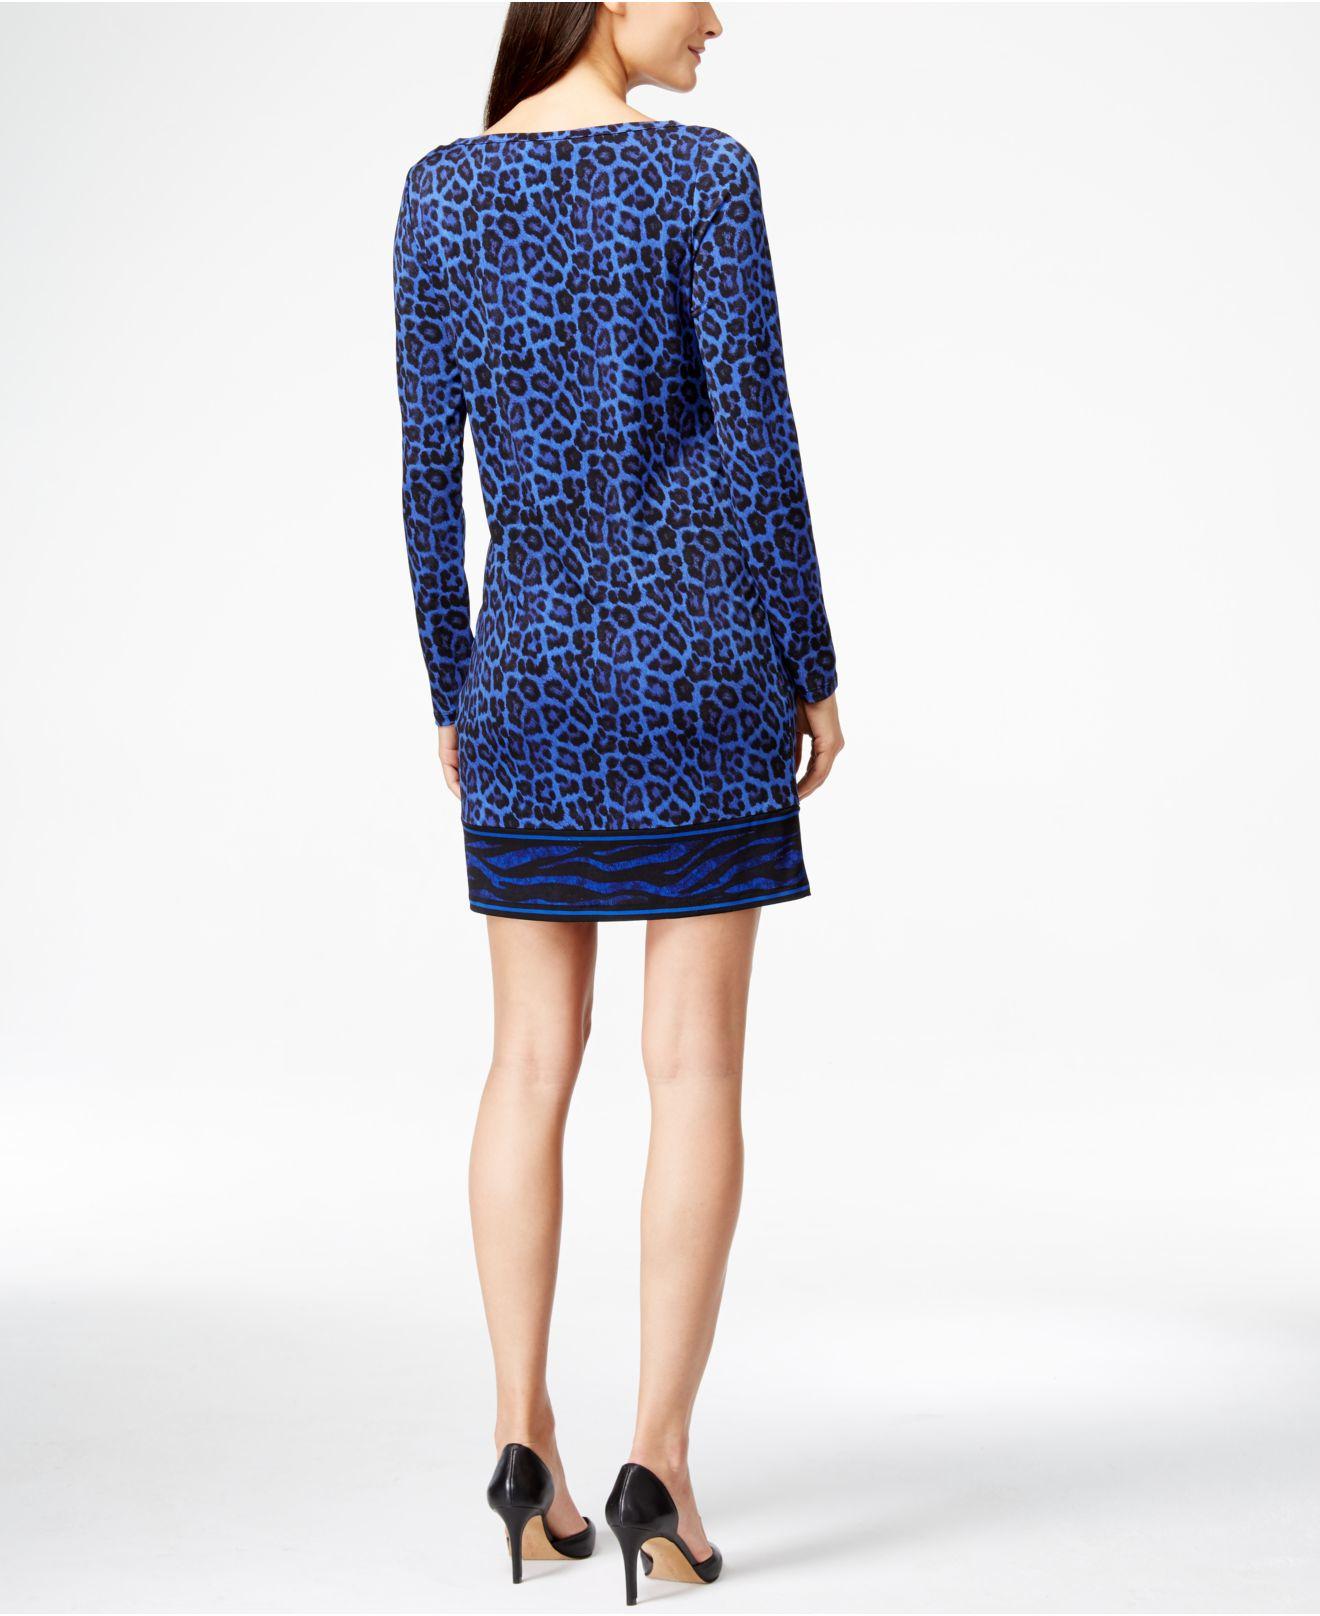 Lyst Michael kors Michael Long sleeve Animal print Dress